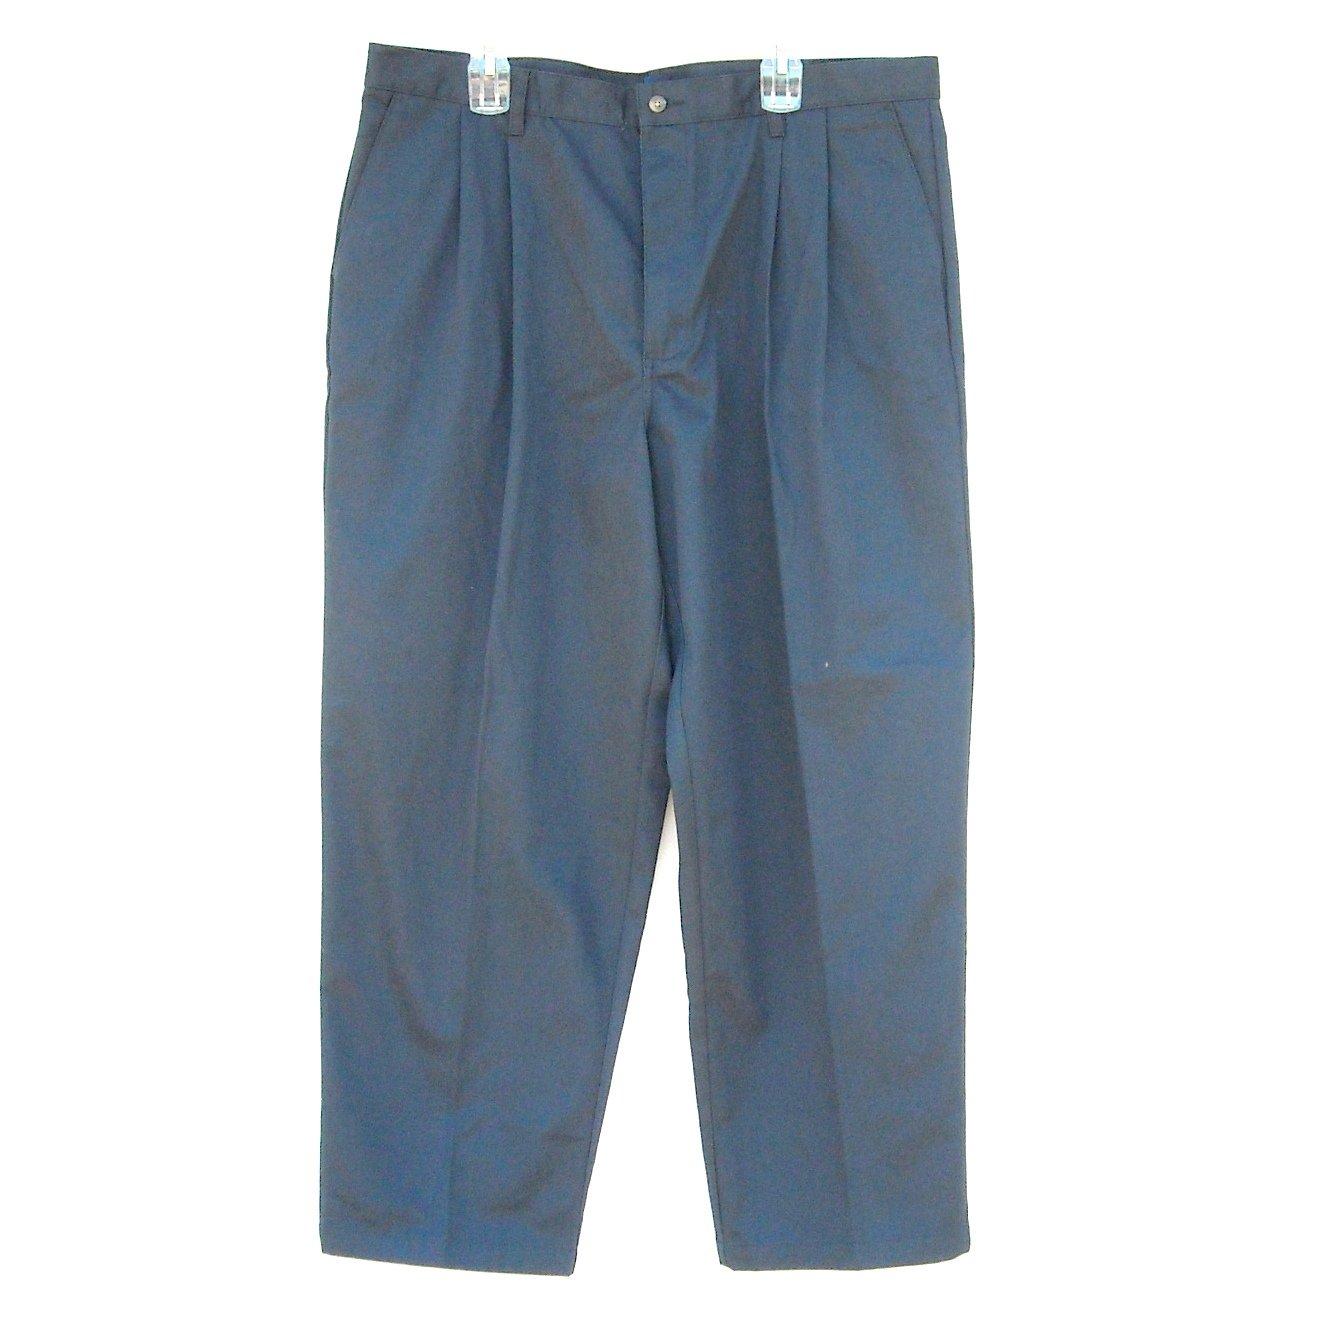 Basic Editions Navy Dark Blue Pants size 42 X 30